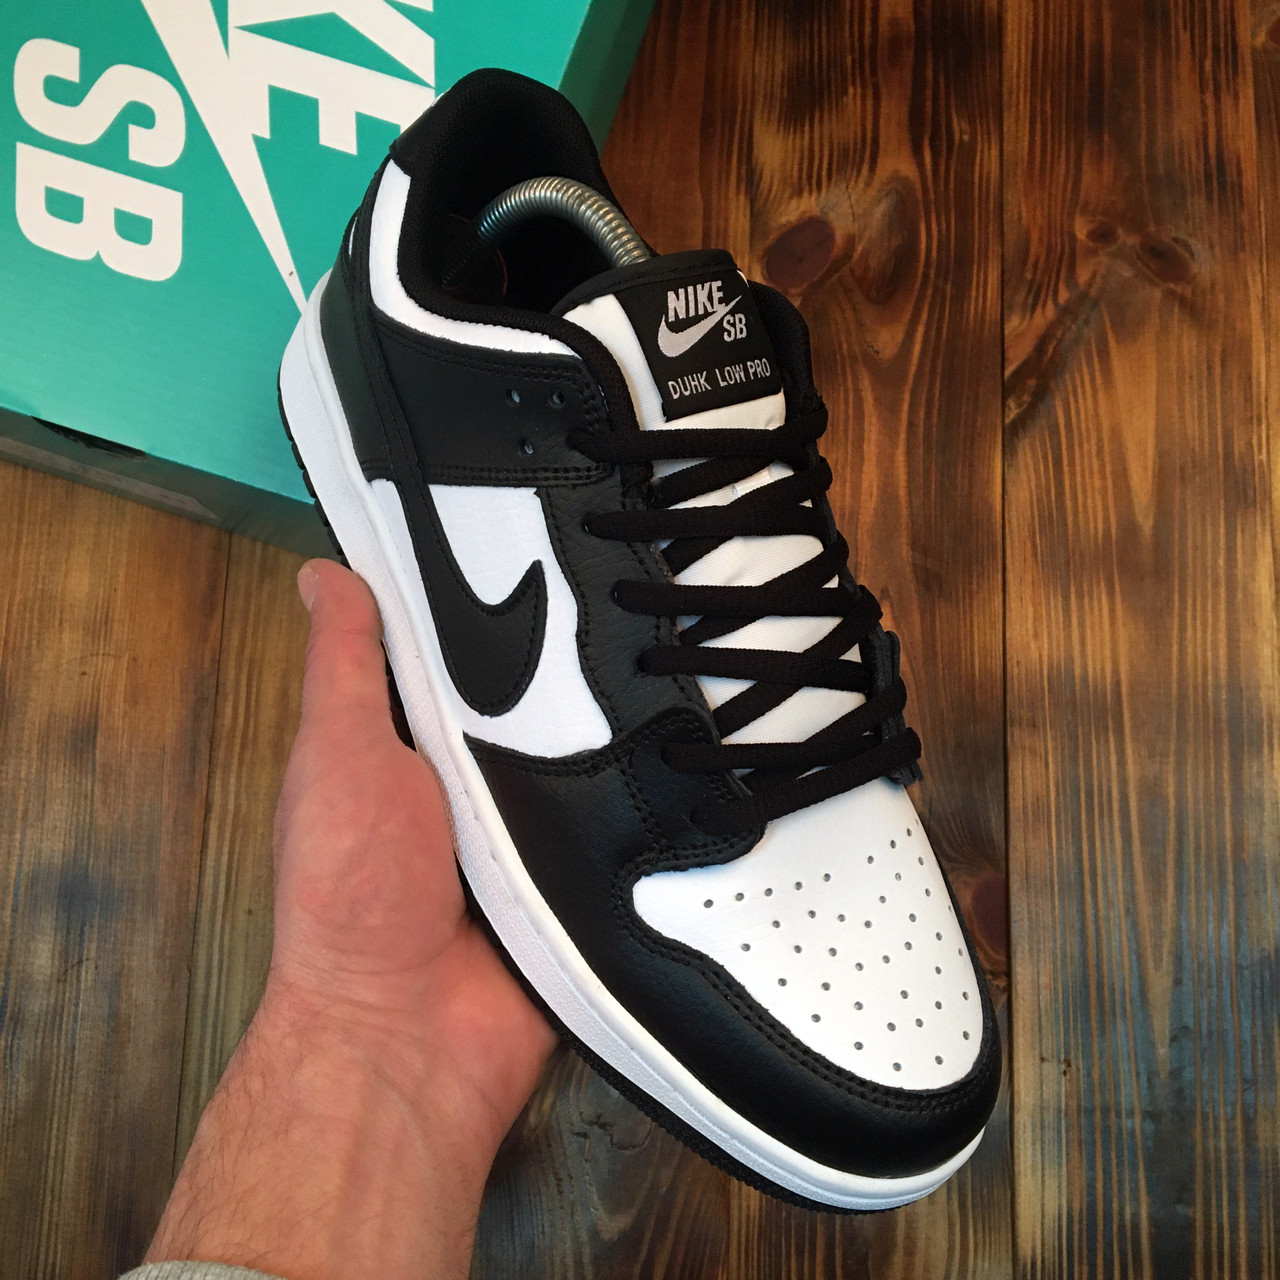 Мужские кроссовки Nike SB Dunk Low White Black ( Реплика )